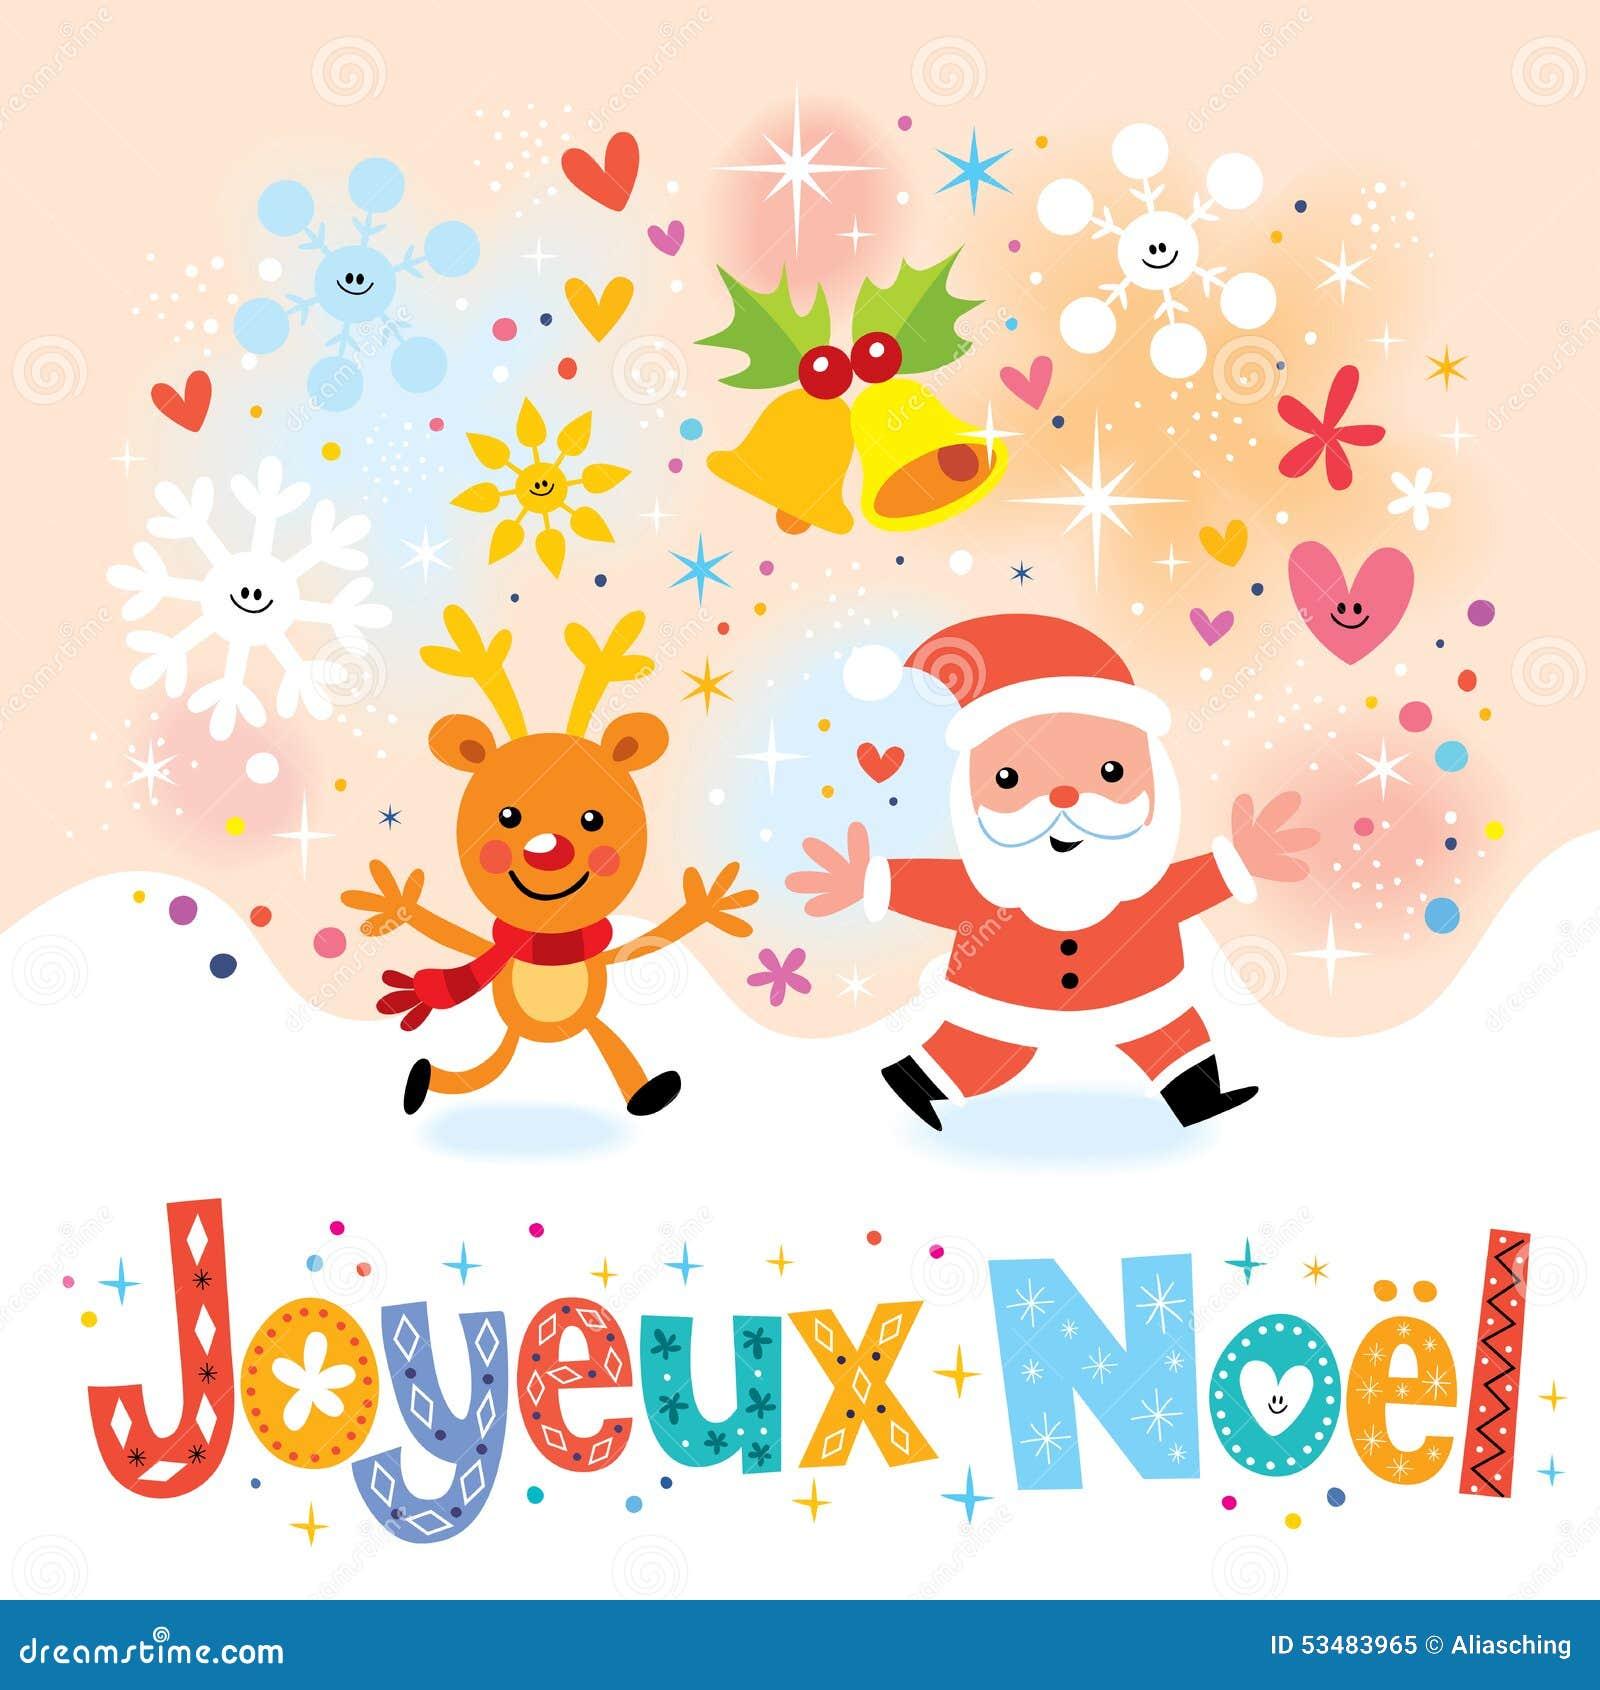 Auguri Di Buon Natale Francese.Joyeux Noel Buon Natale Nella Cartolina D Auguri Francese